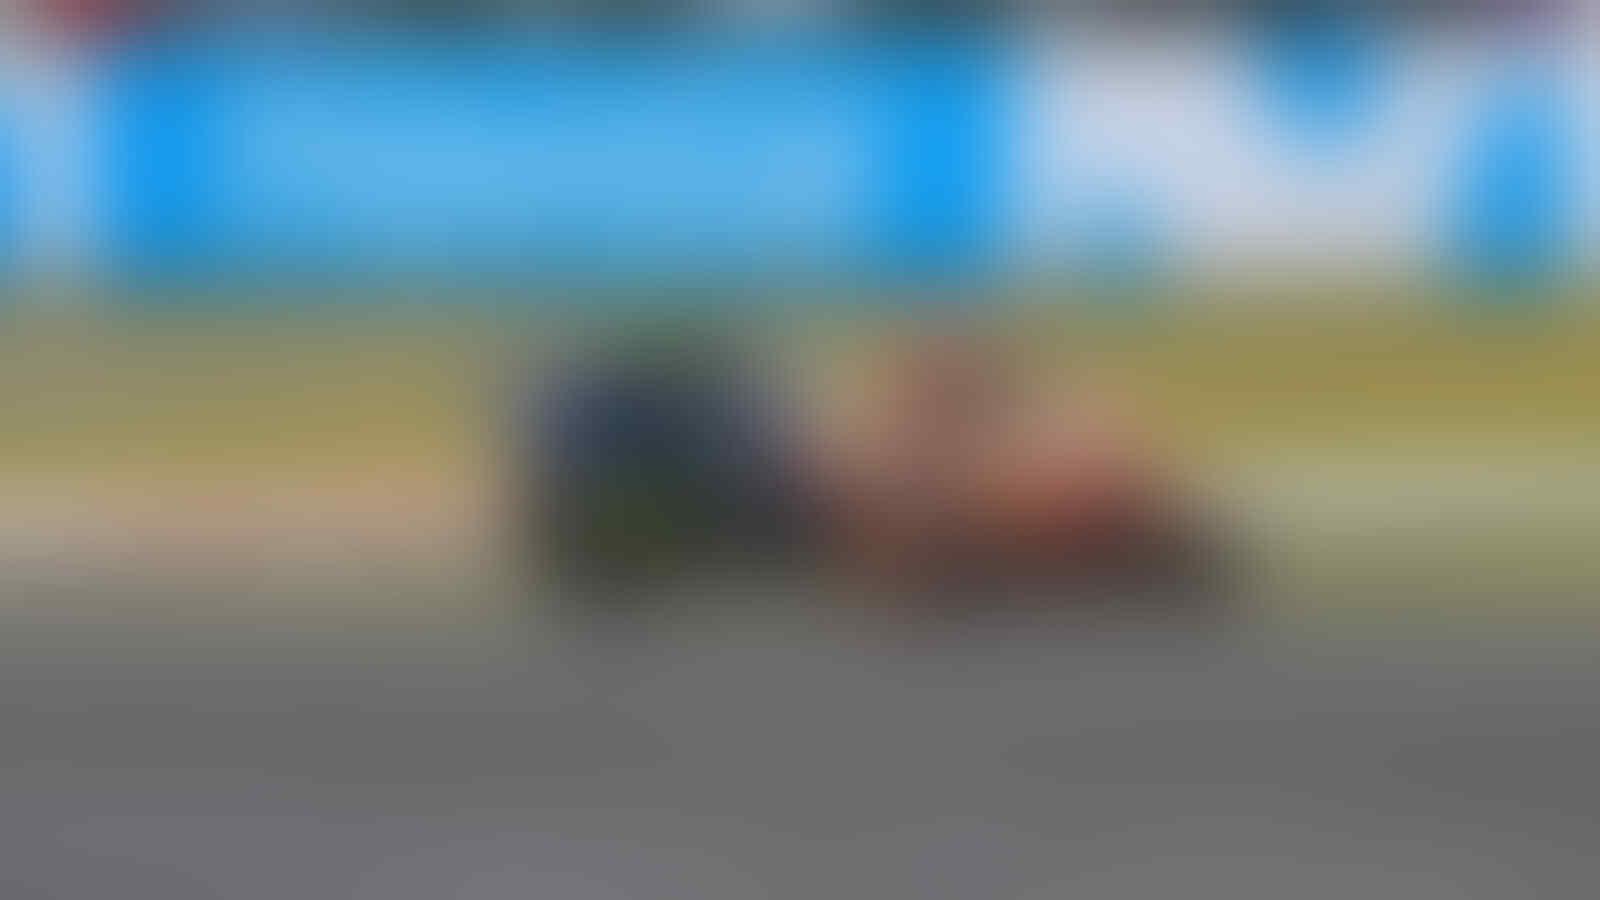 Vinales Ogah Komentari Insiden Rossi-Marquez